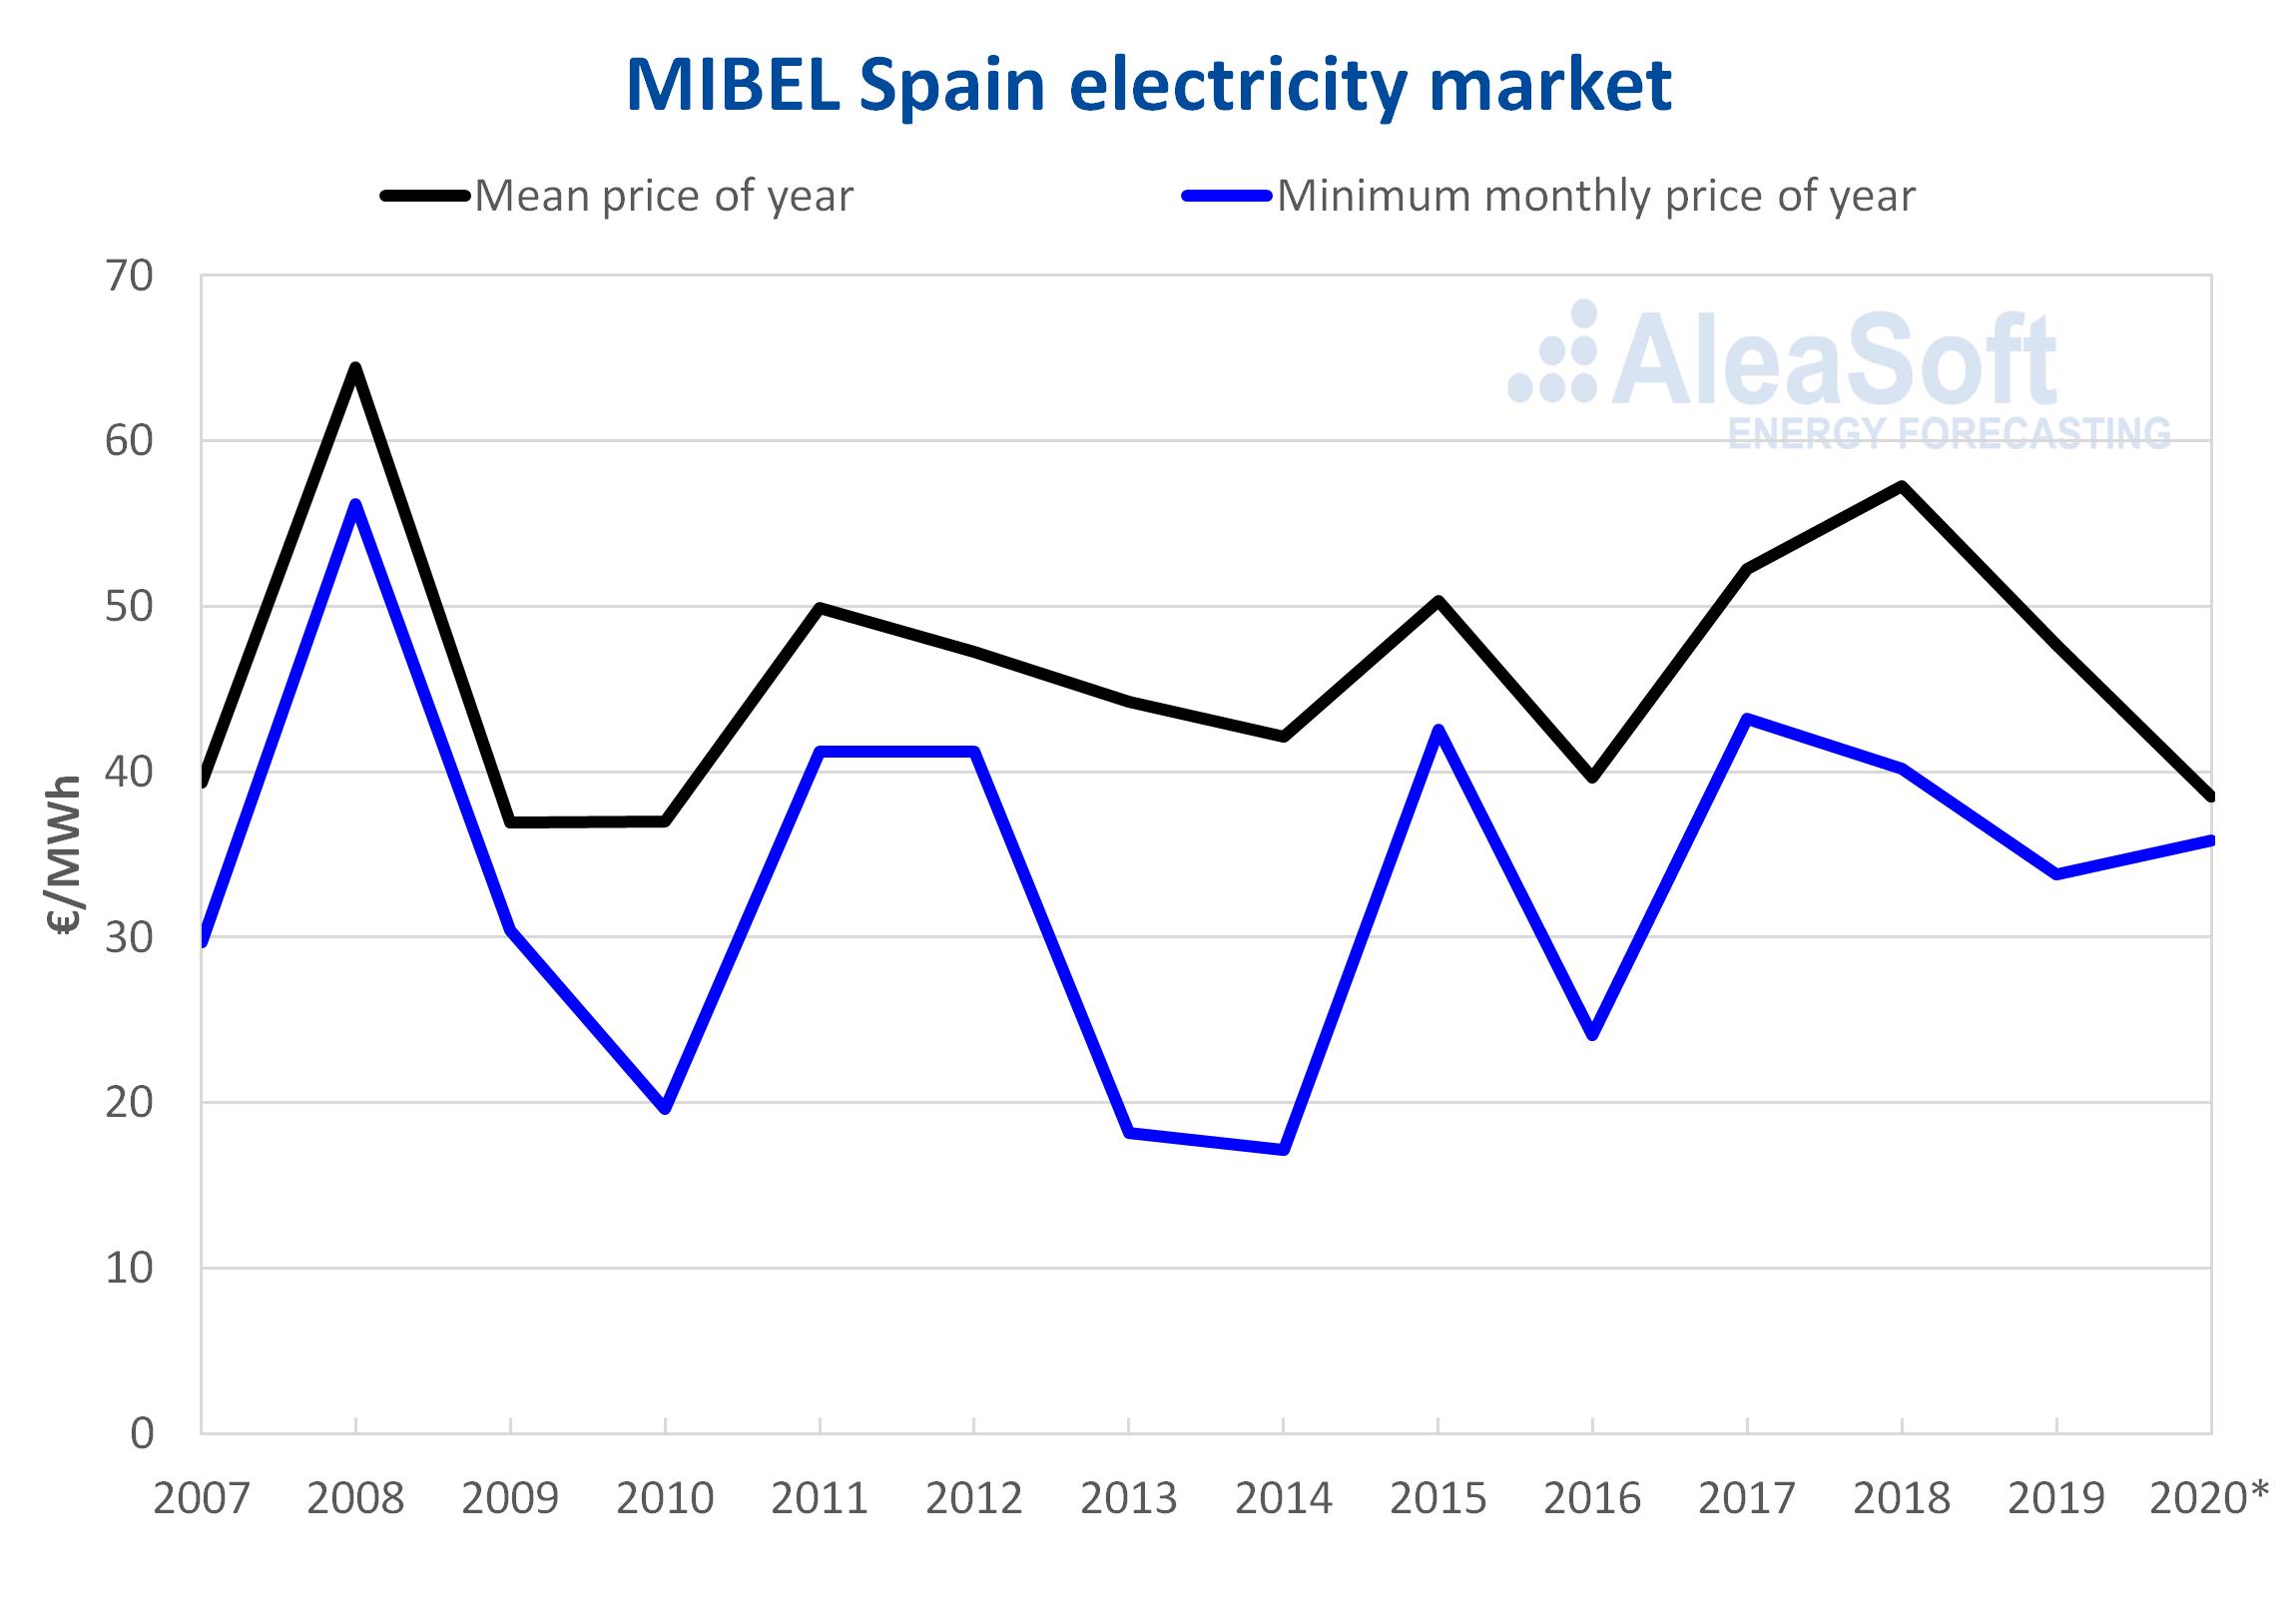 AleaSoft - Mibel spain electricity market annual mean minimun monhtly price